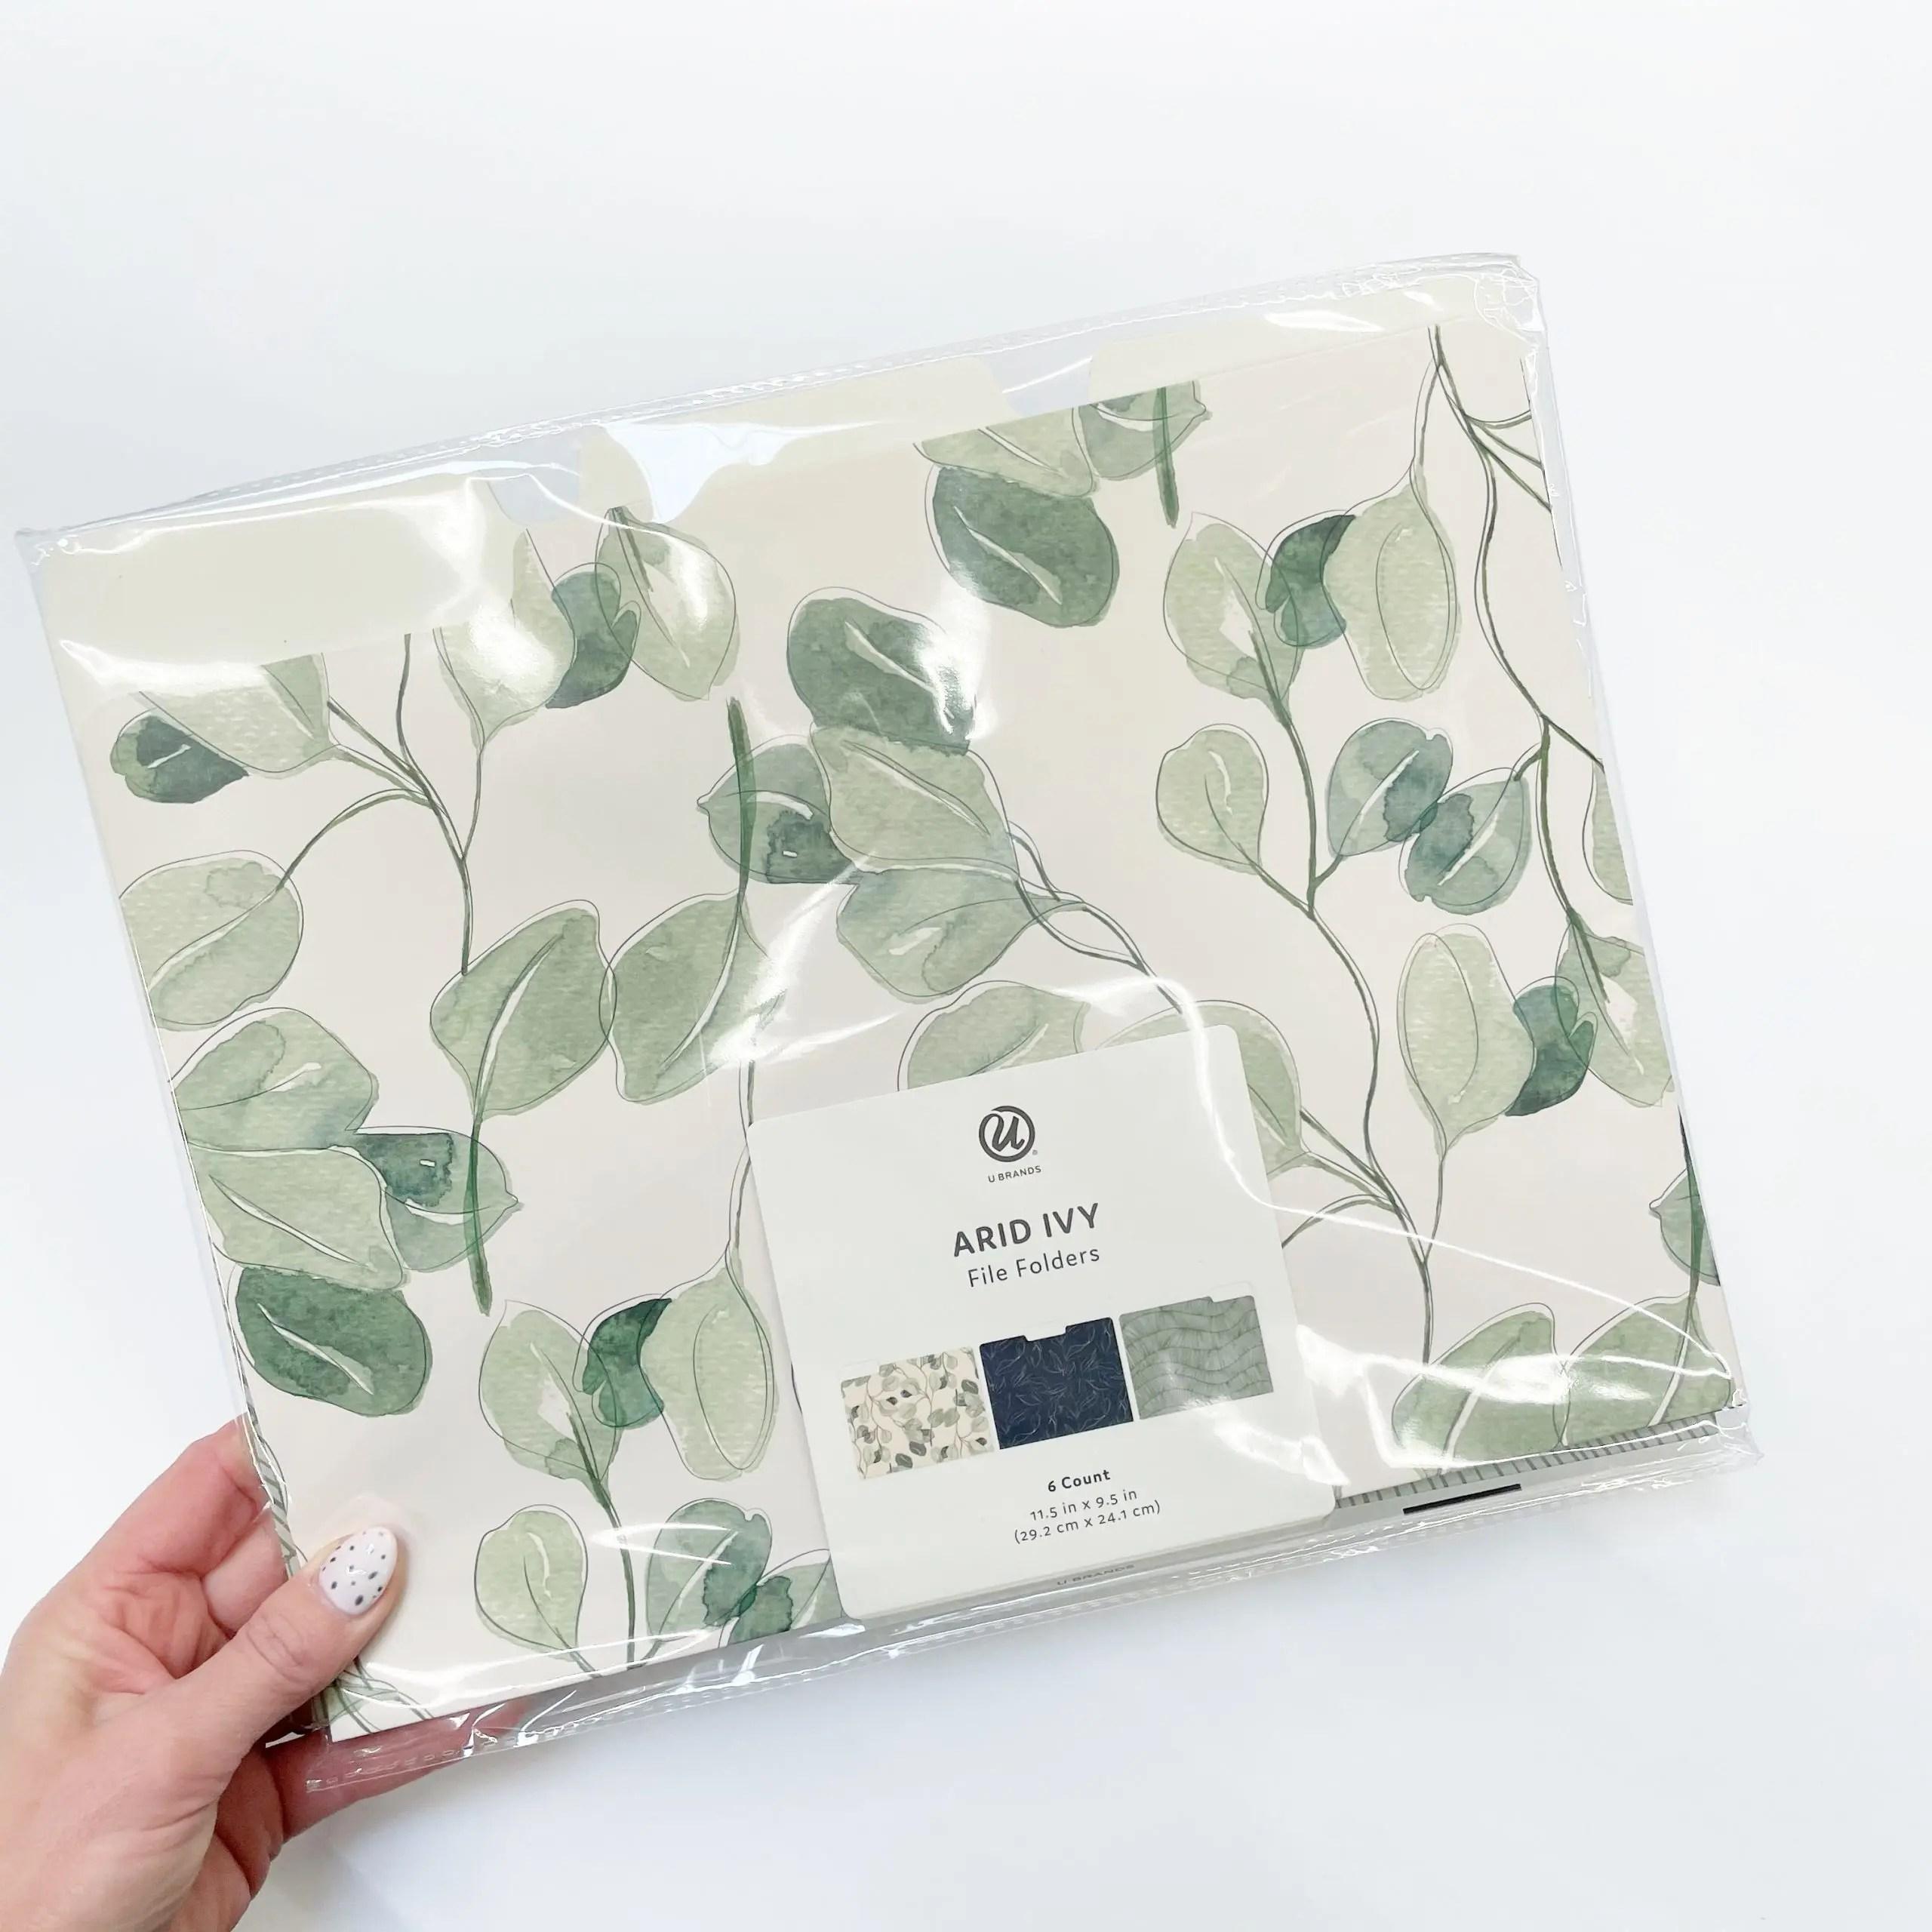 U Brands Arid Ivy File Folders